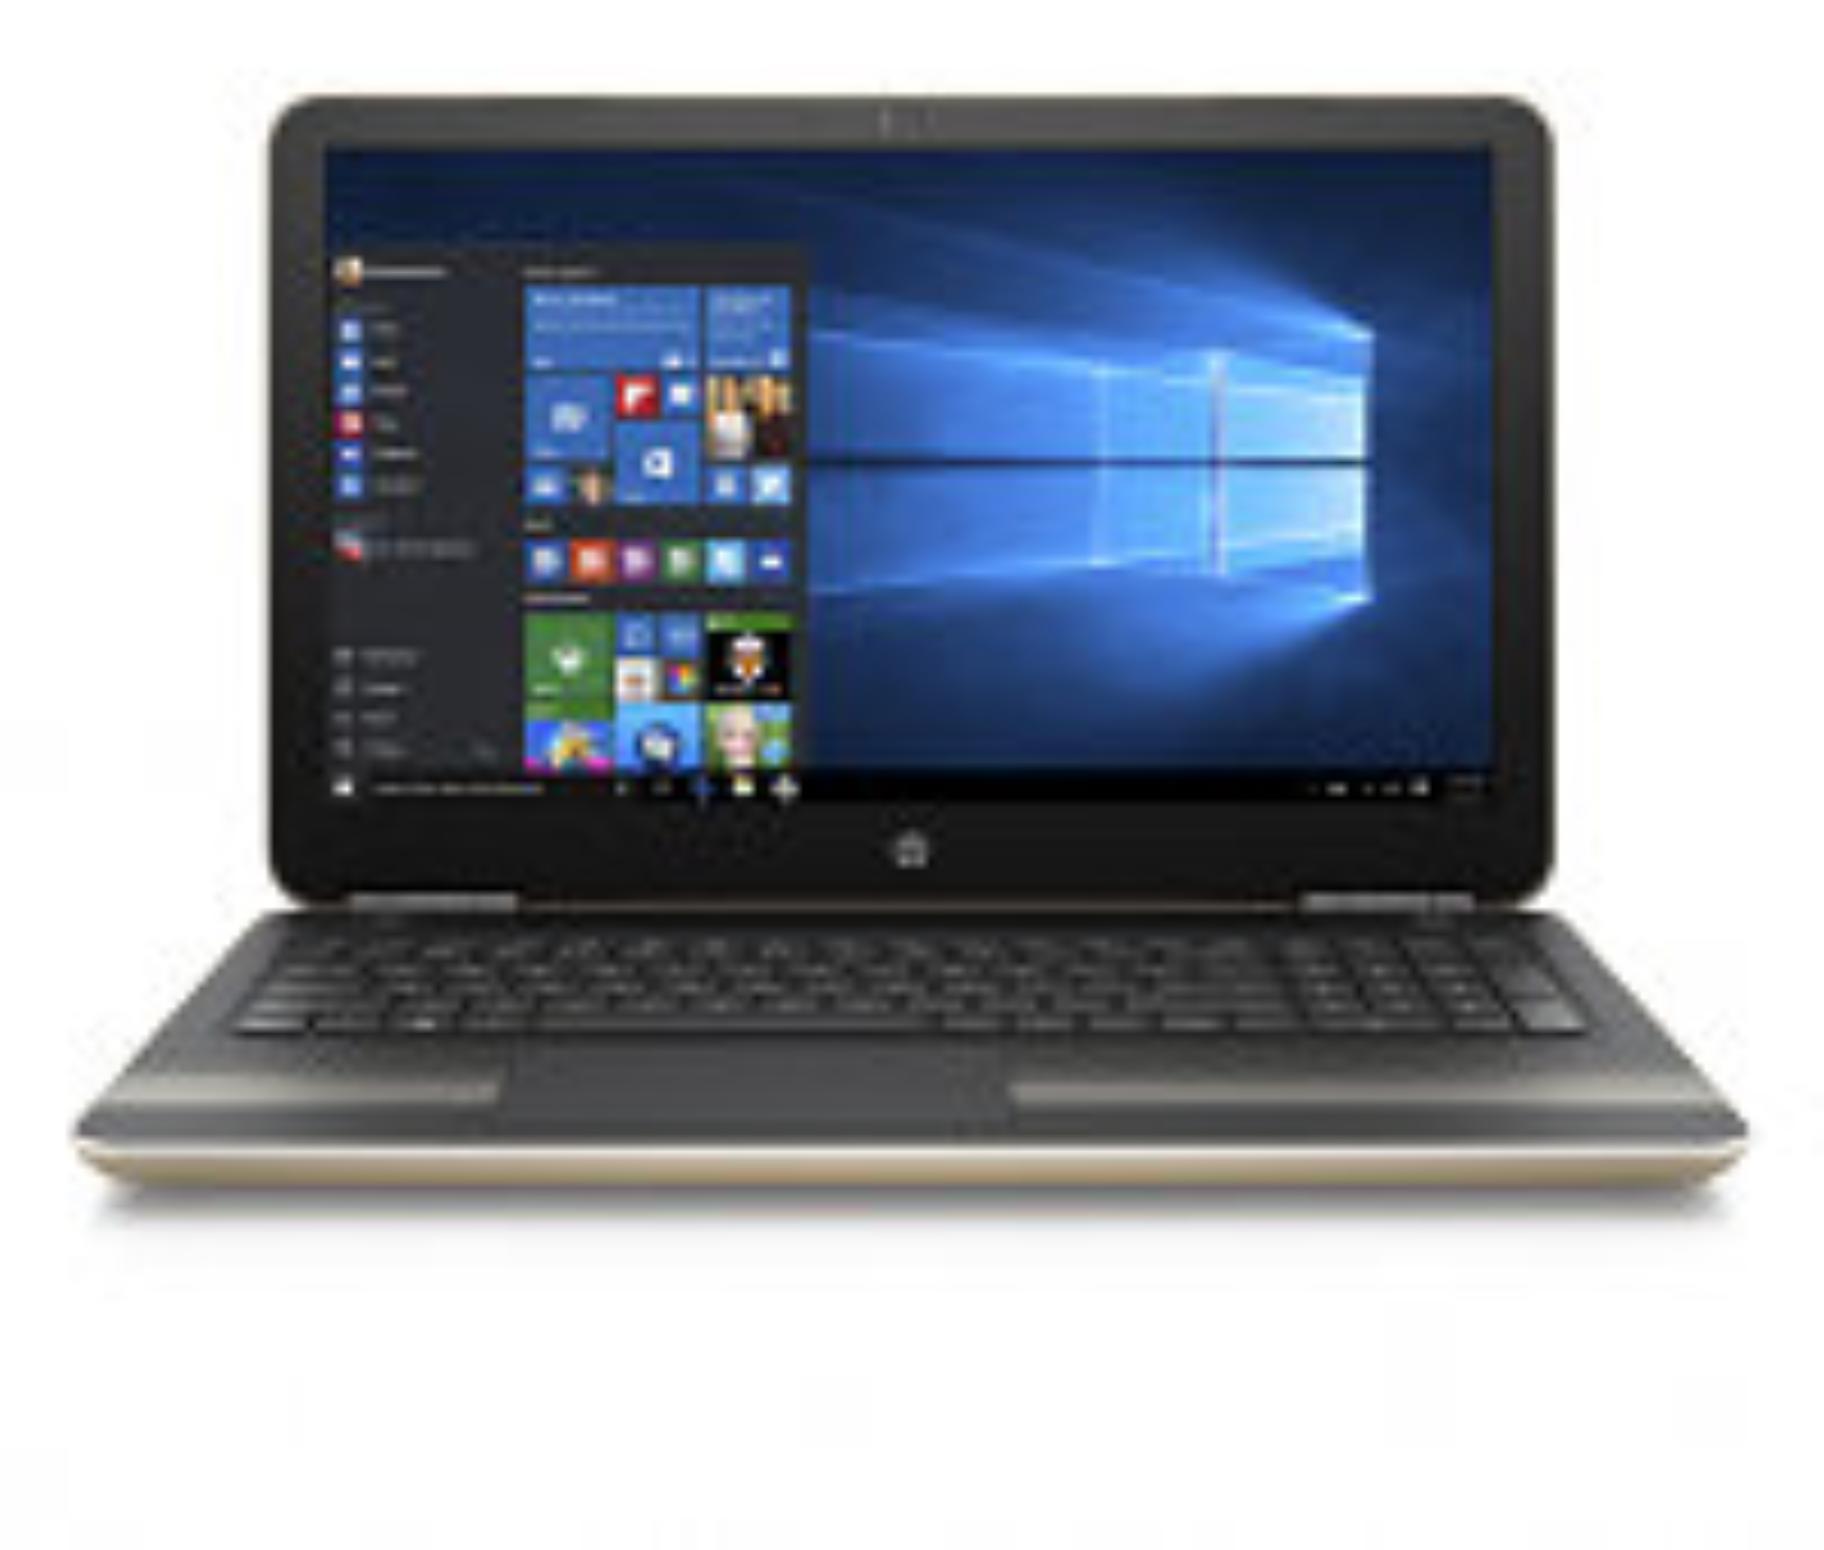 HP Pavilion 15-aw019-nc FHD A10-9600/8GB/256SSD/DVD/ATI/2RServis/W10-gold